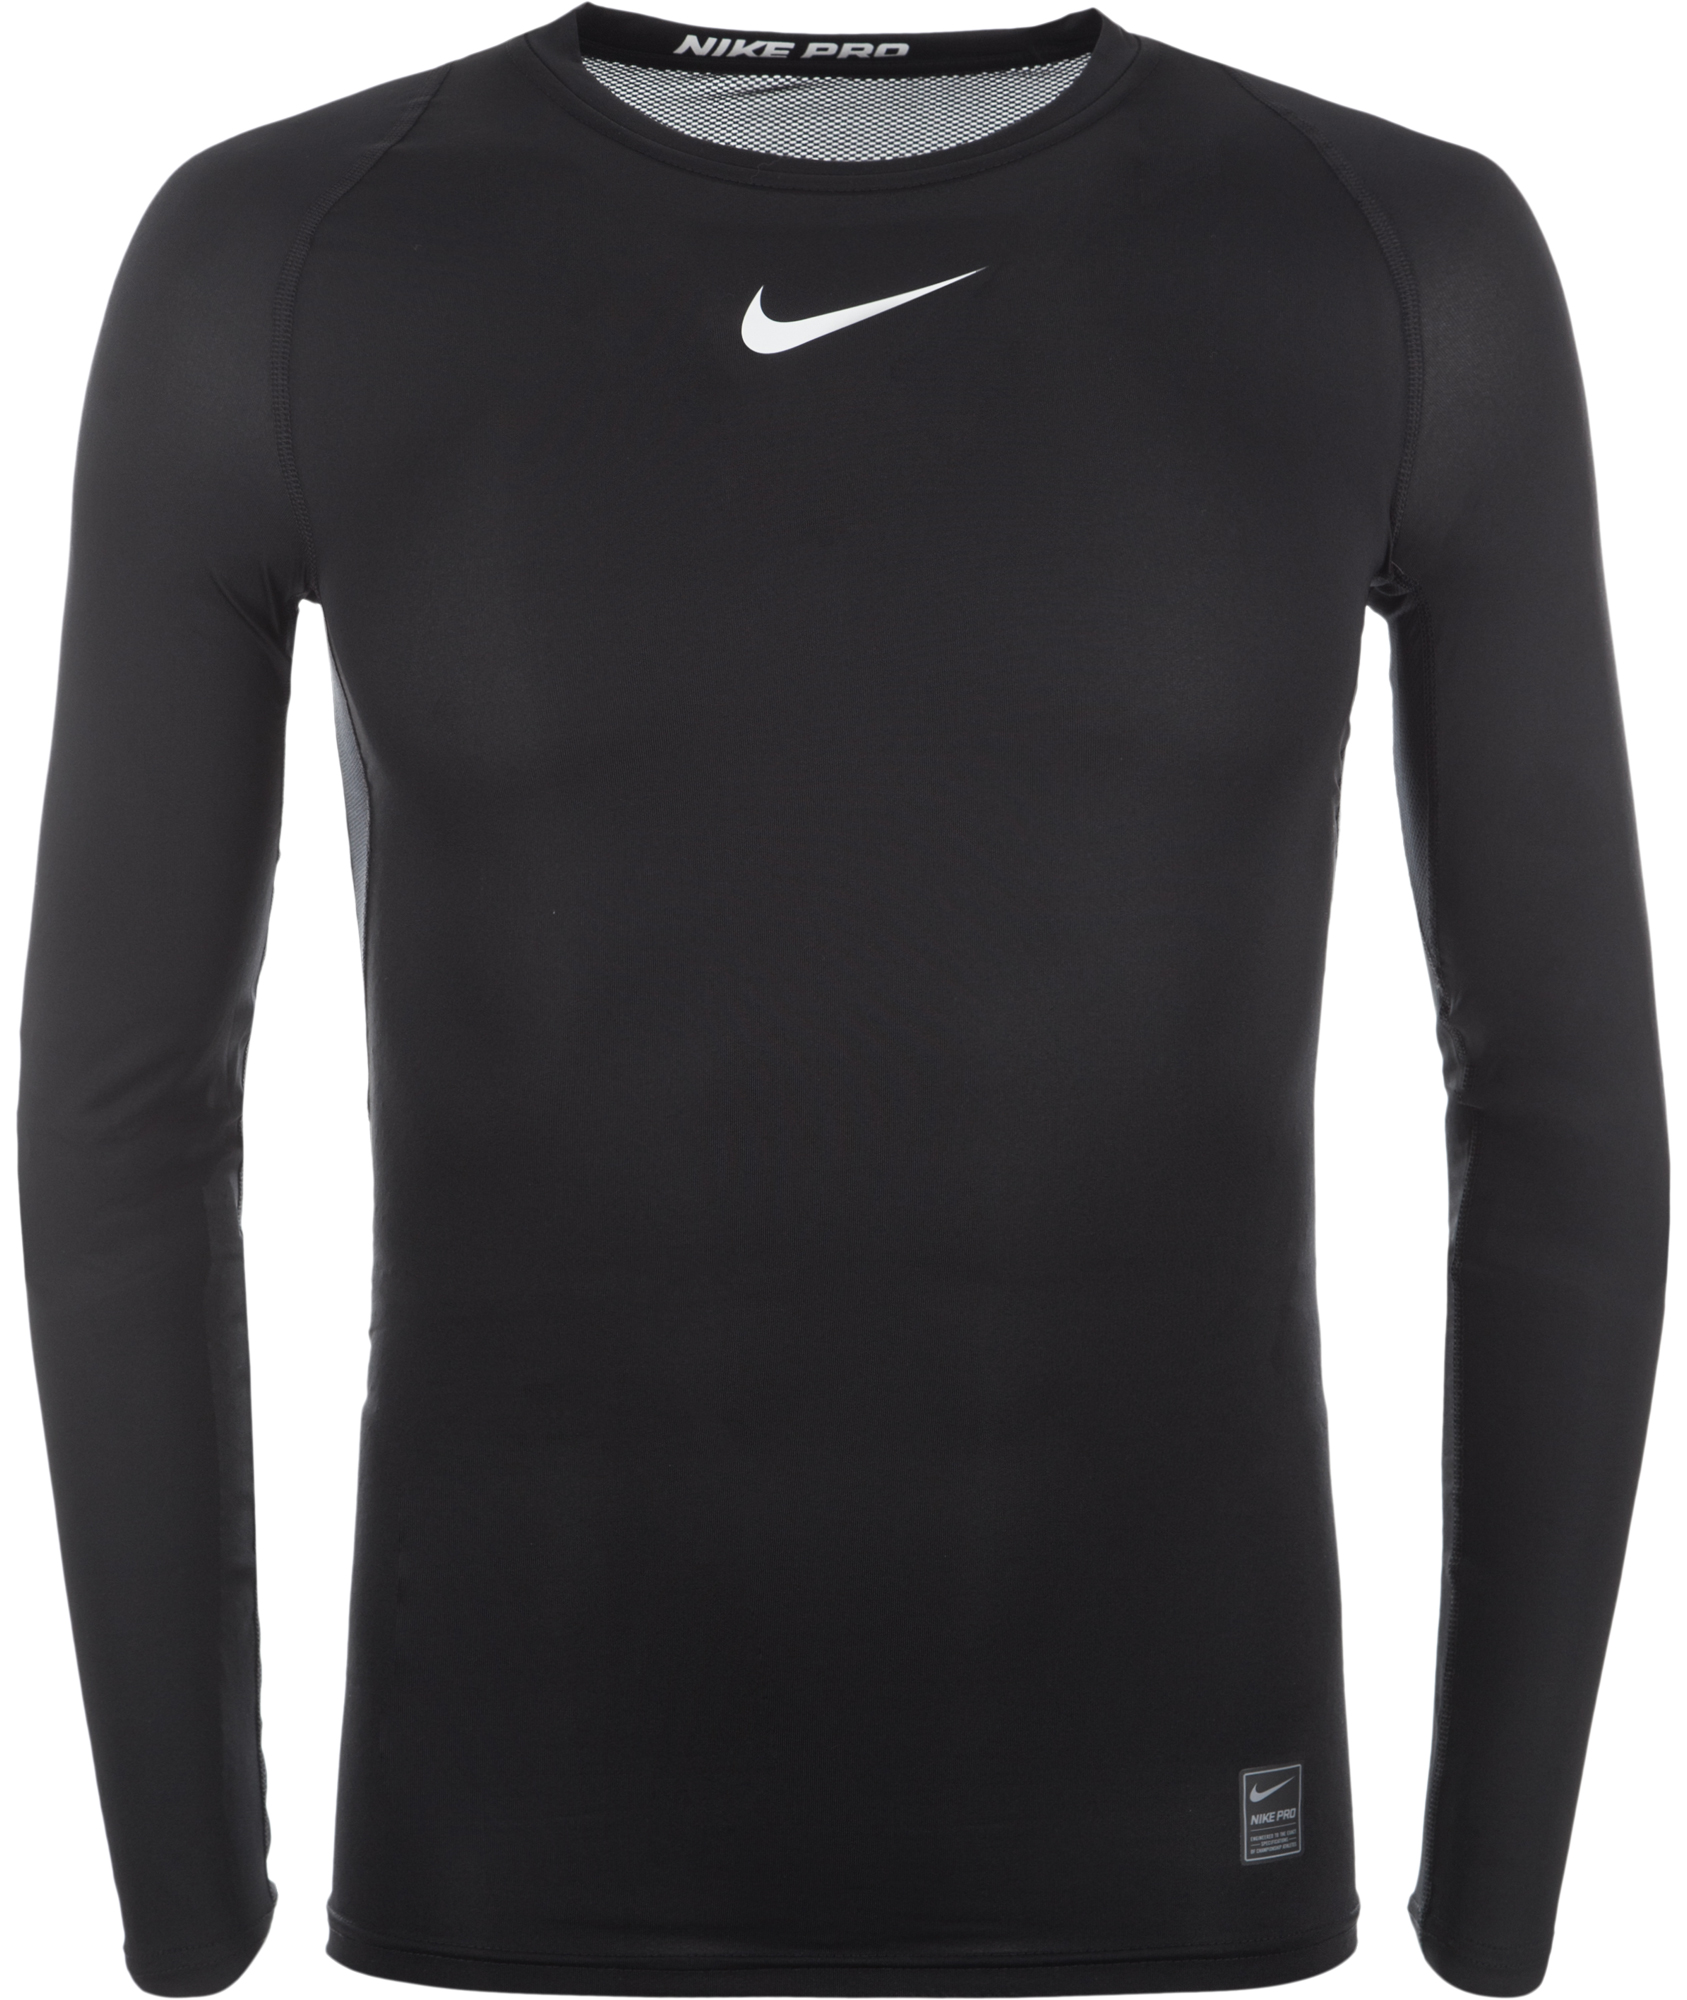 Nike Футболка с длинным рукавом мужская Nike Pro, размер 54-56 цена